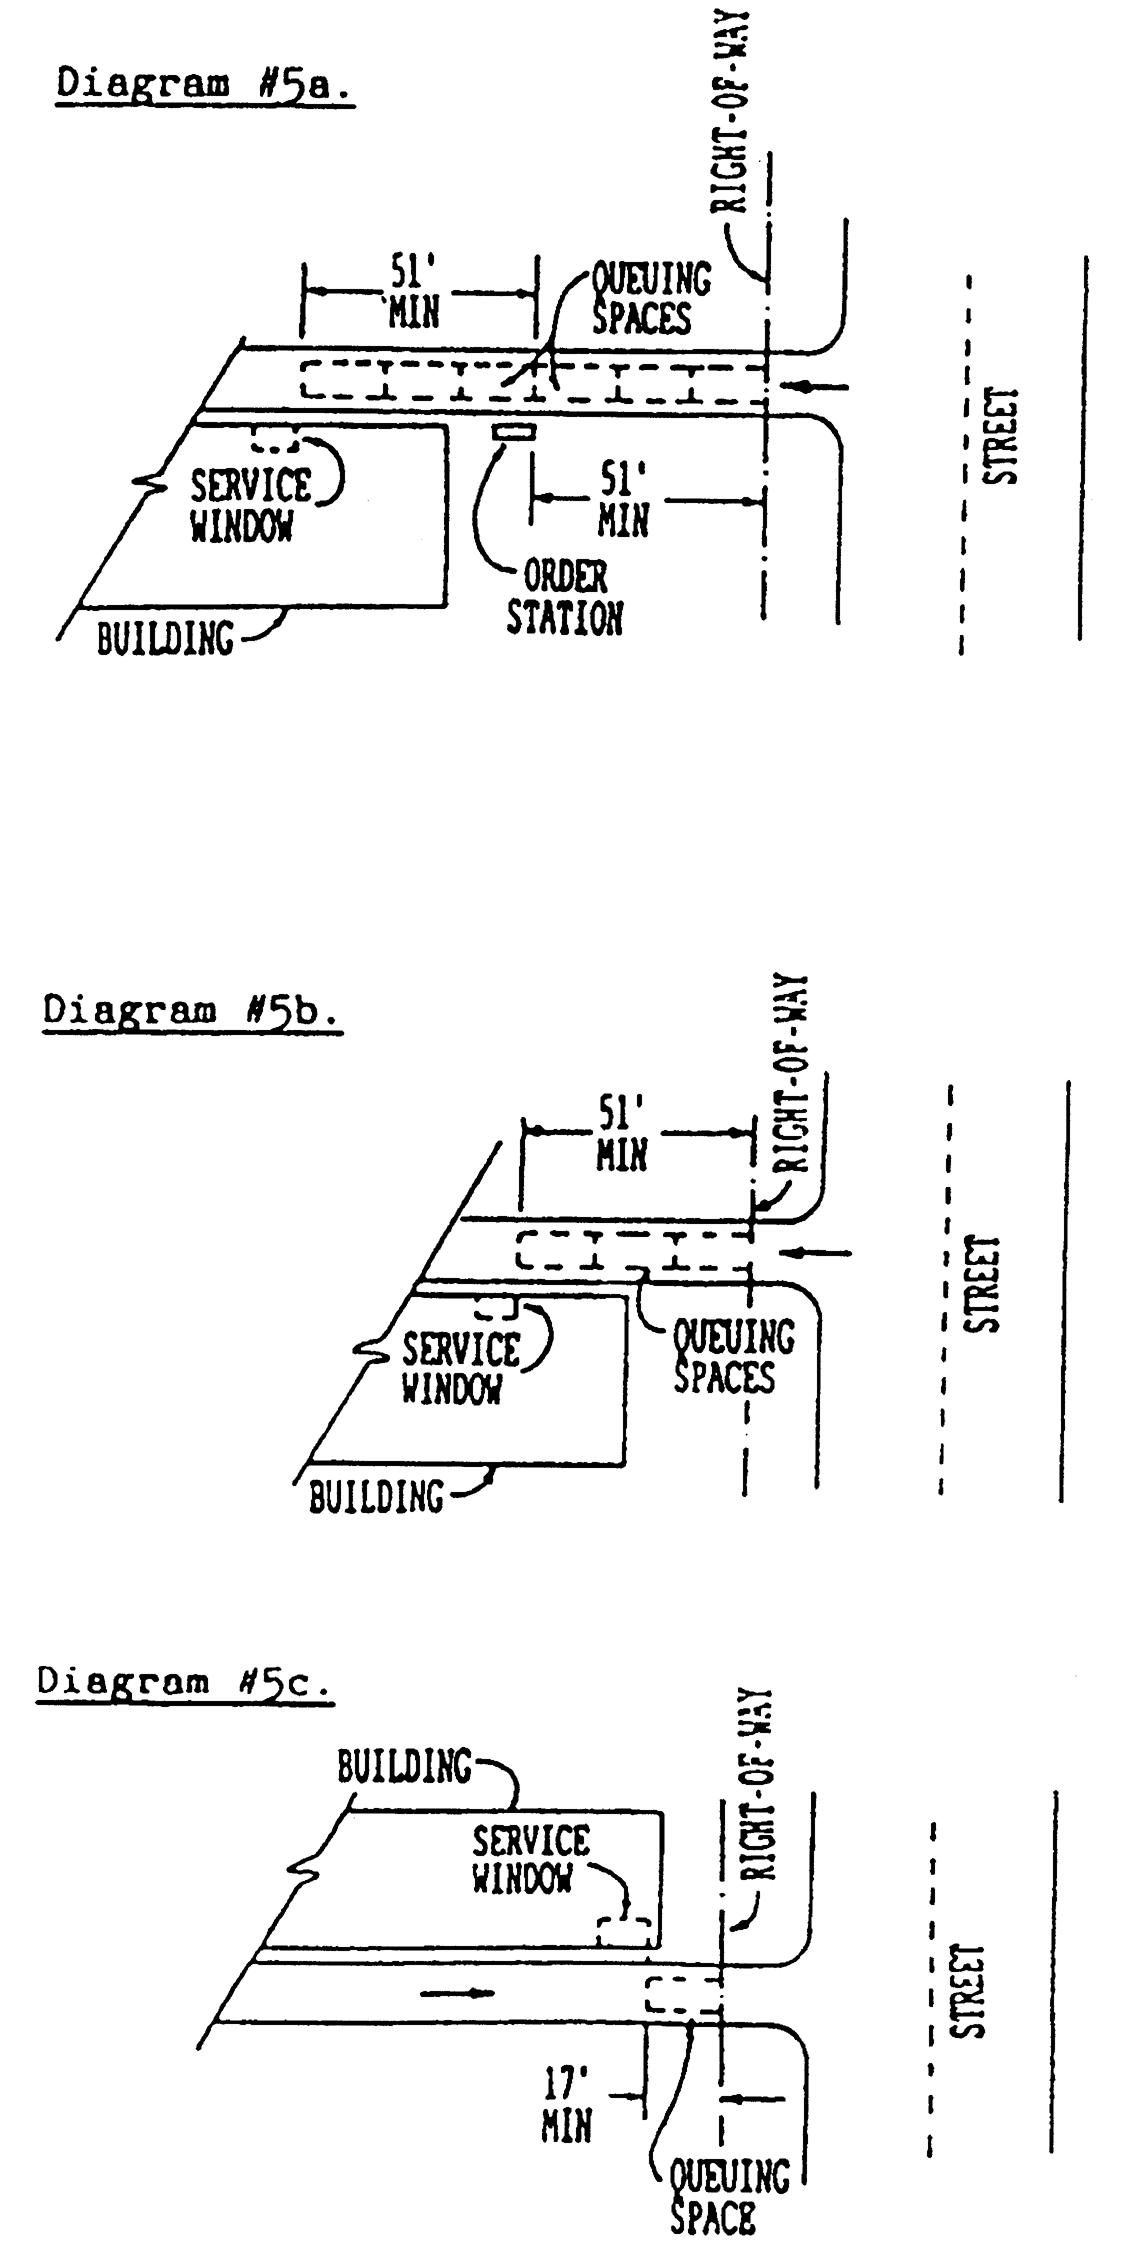 Superb Haulmark Wiring Diagram Haulmark Circuit Diagrams Circuit Diagram Wiring Cloud Cosmuggs Outletorg